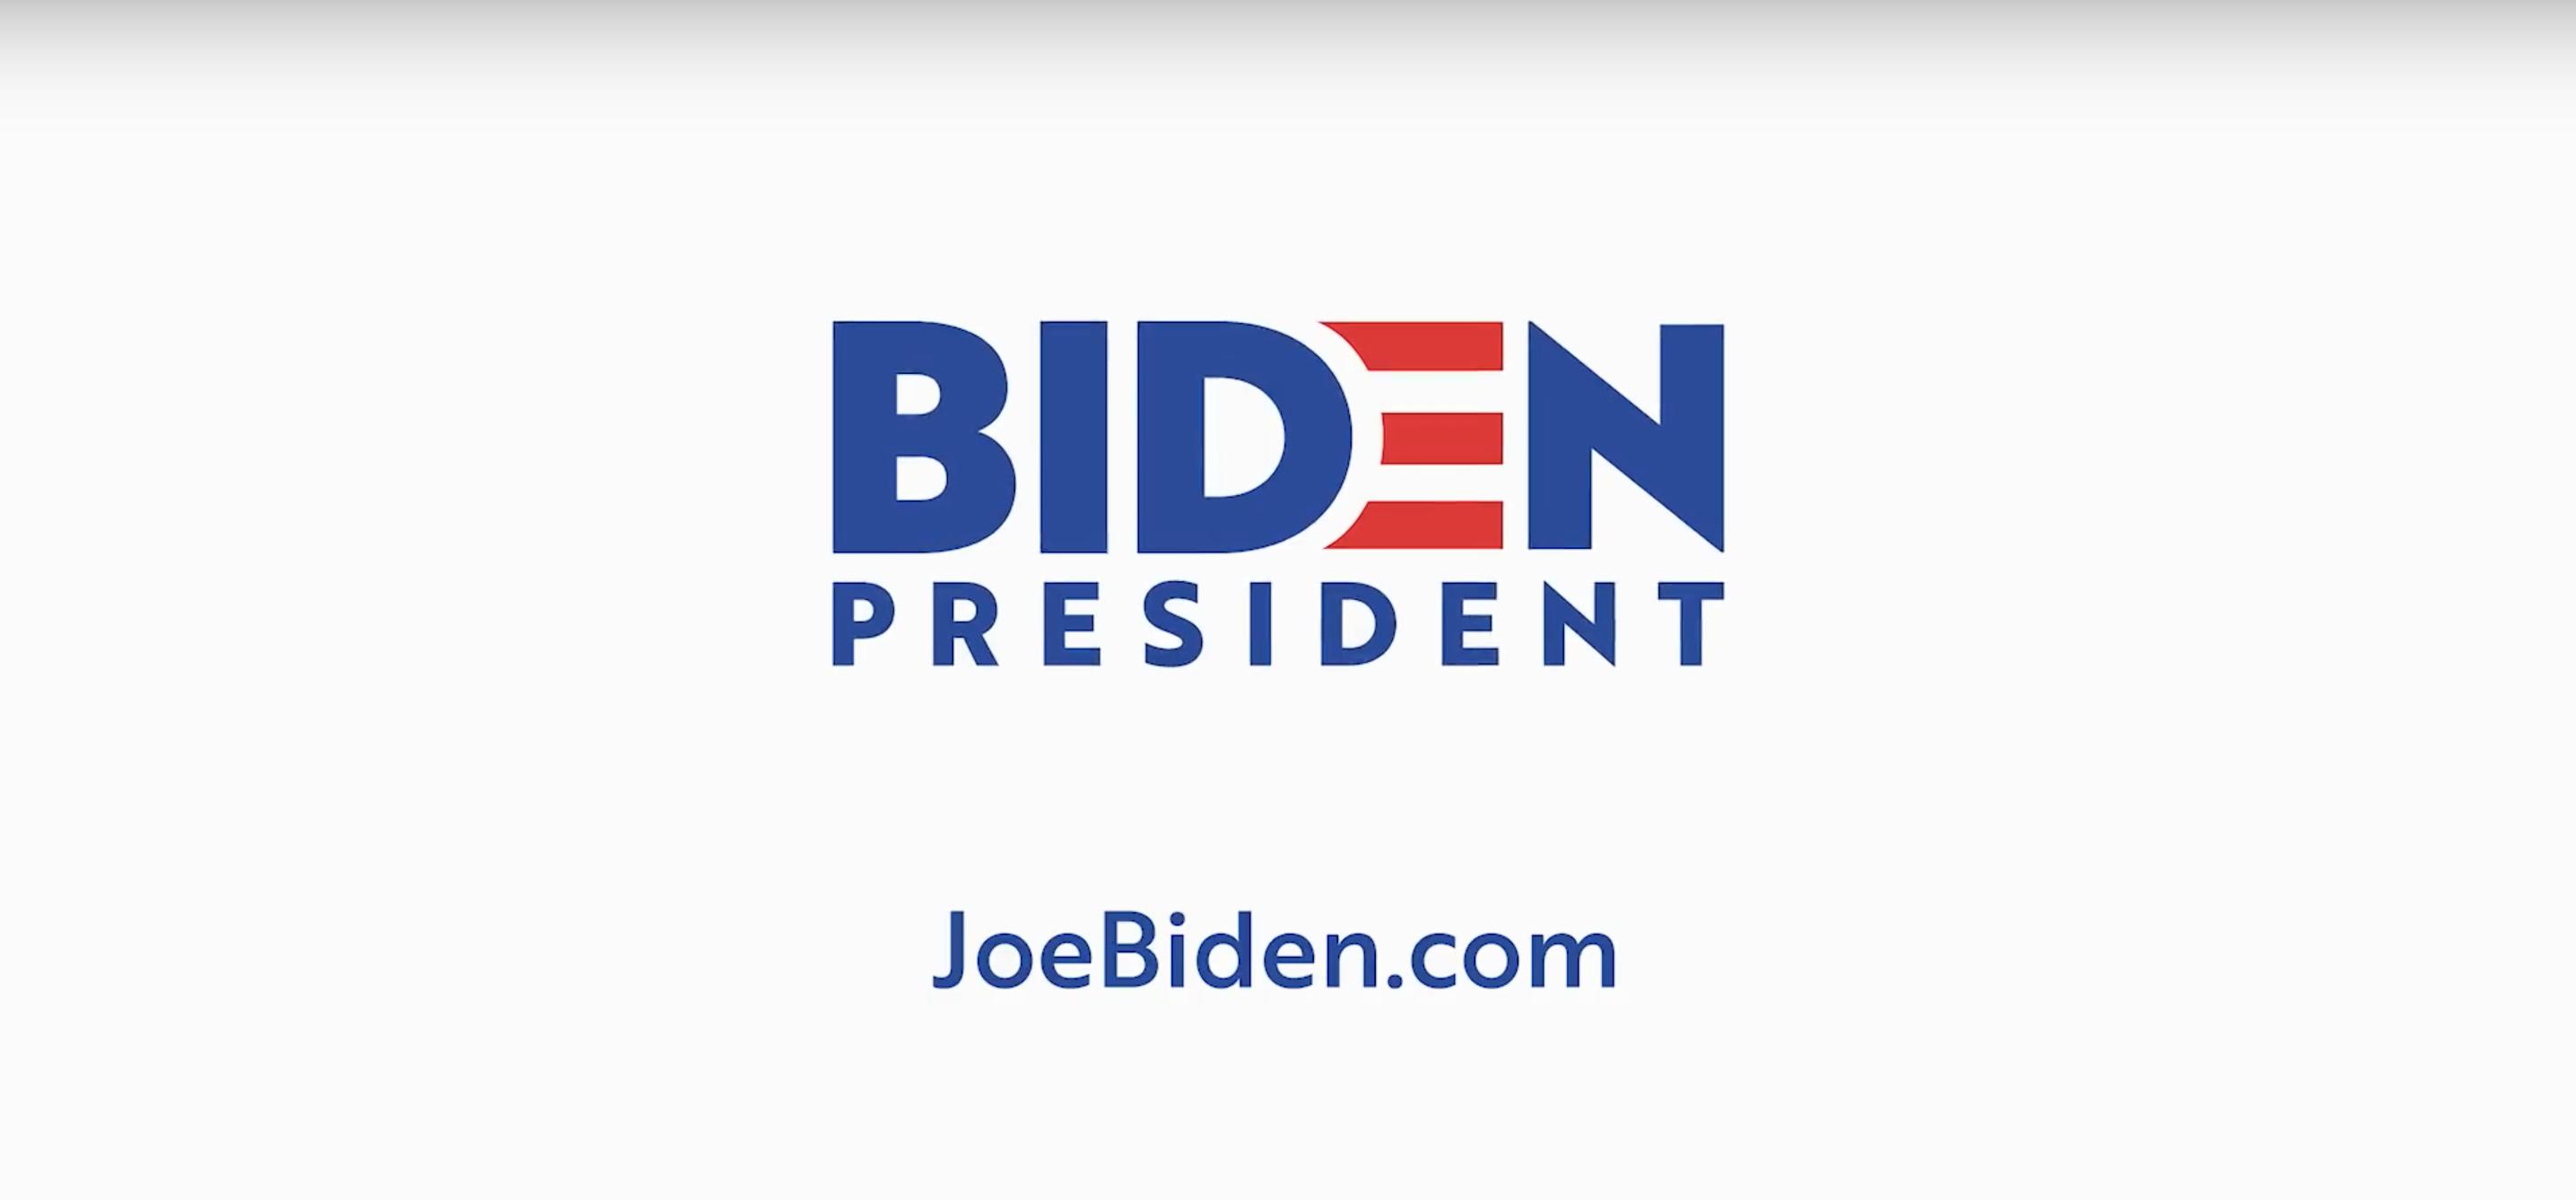 Biden announces 2020 run, but can he win?